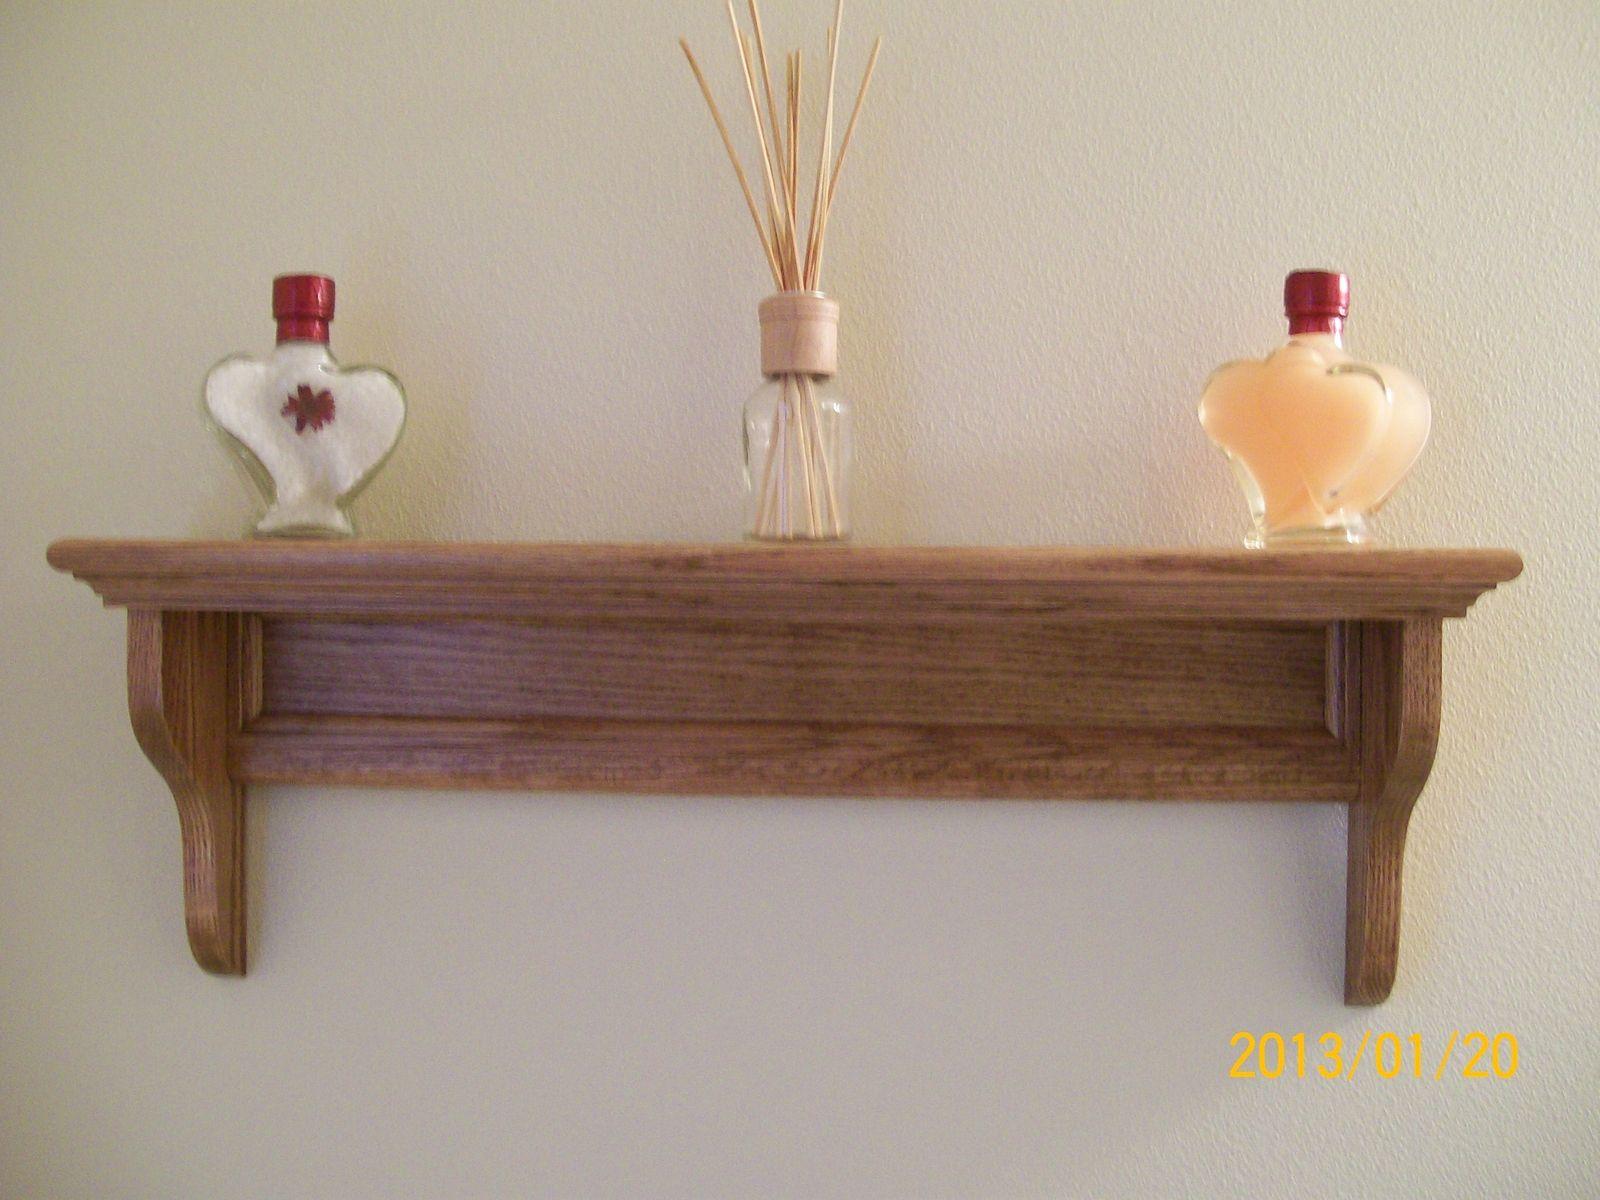 Custom made decorative bathroom shelf